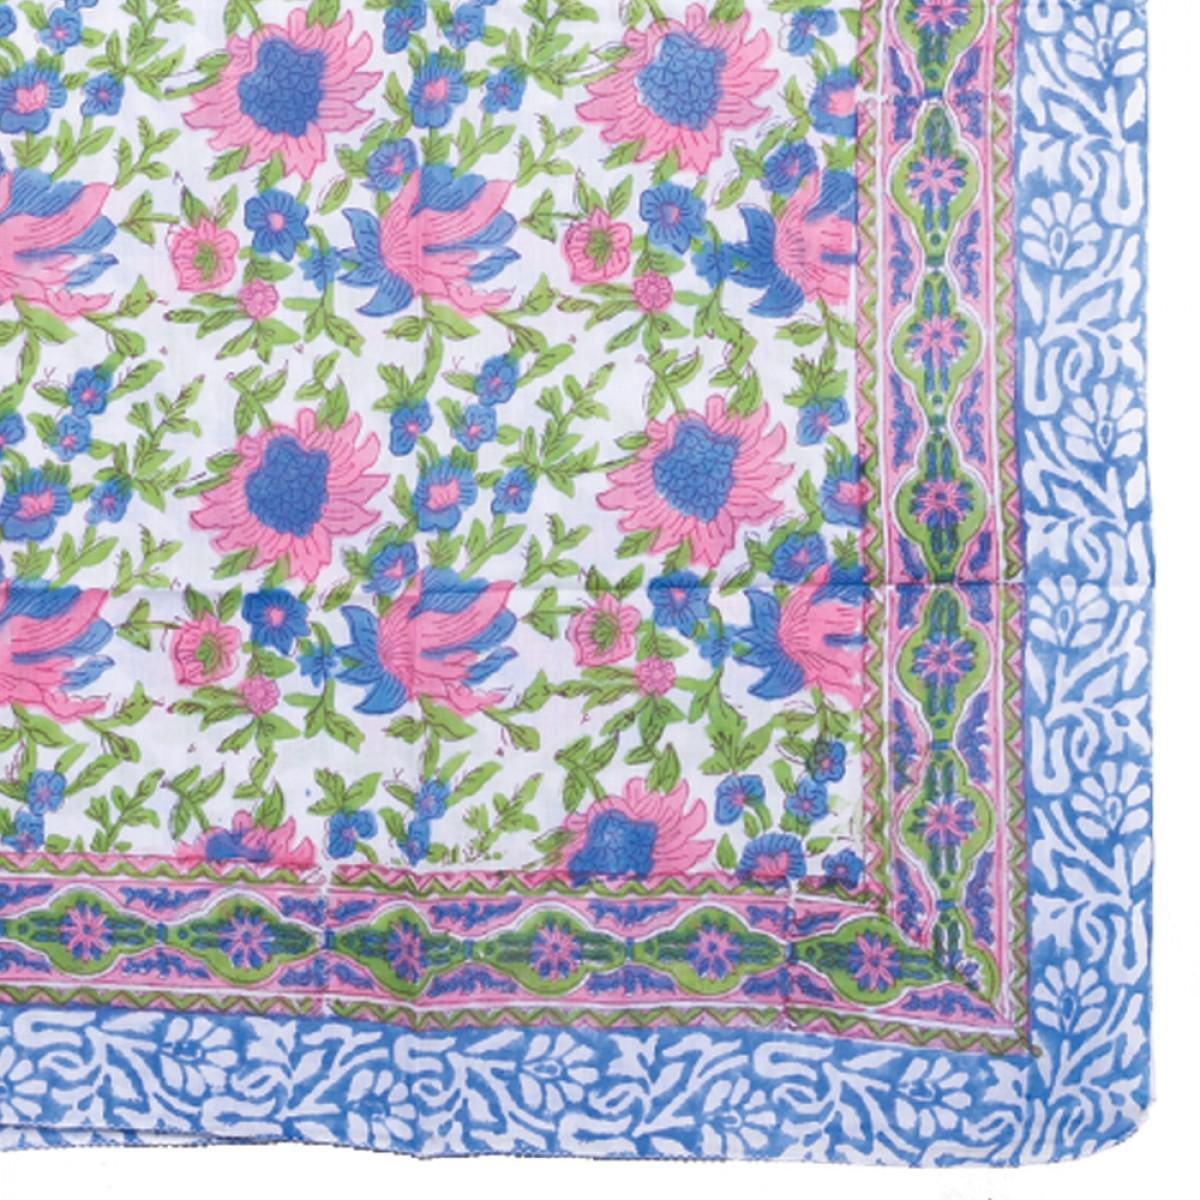 Hand Block Printed Sarongs - Carnation Pink Floral